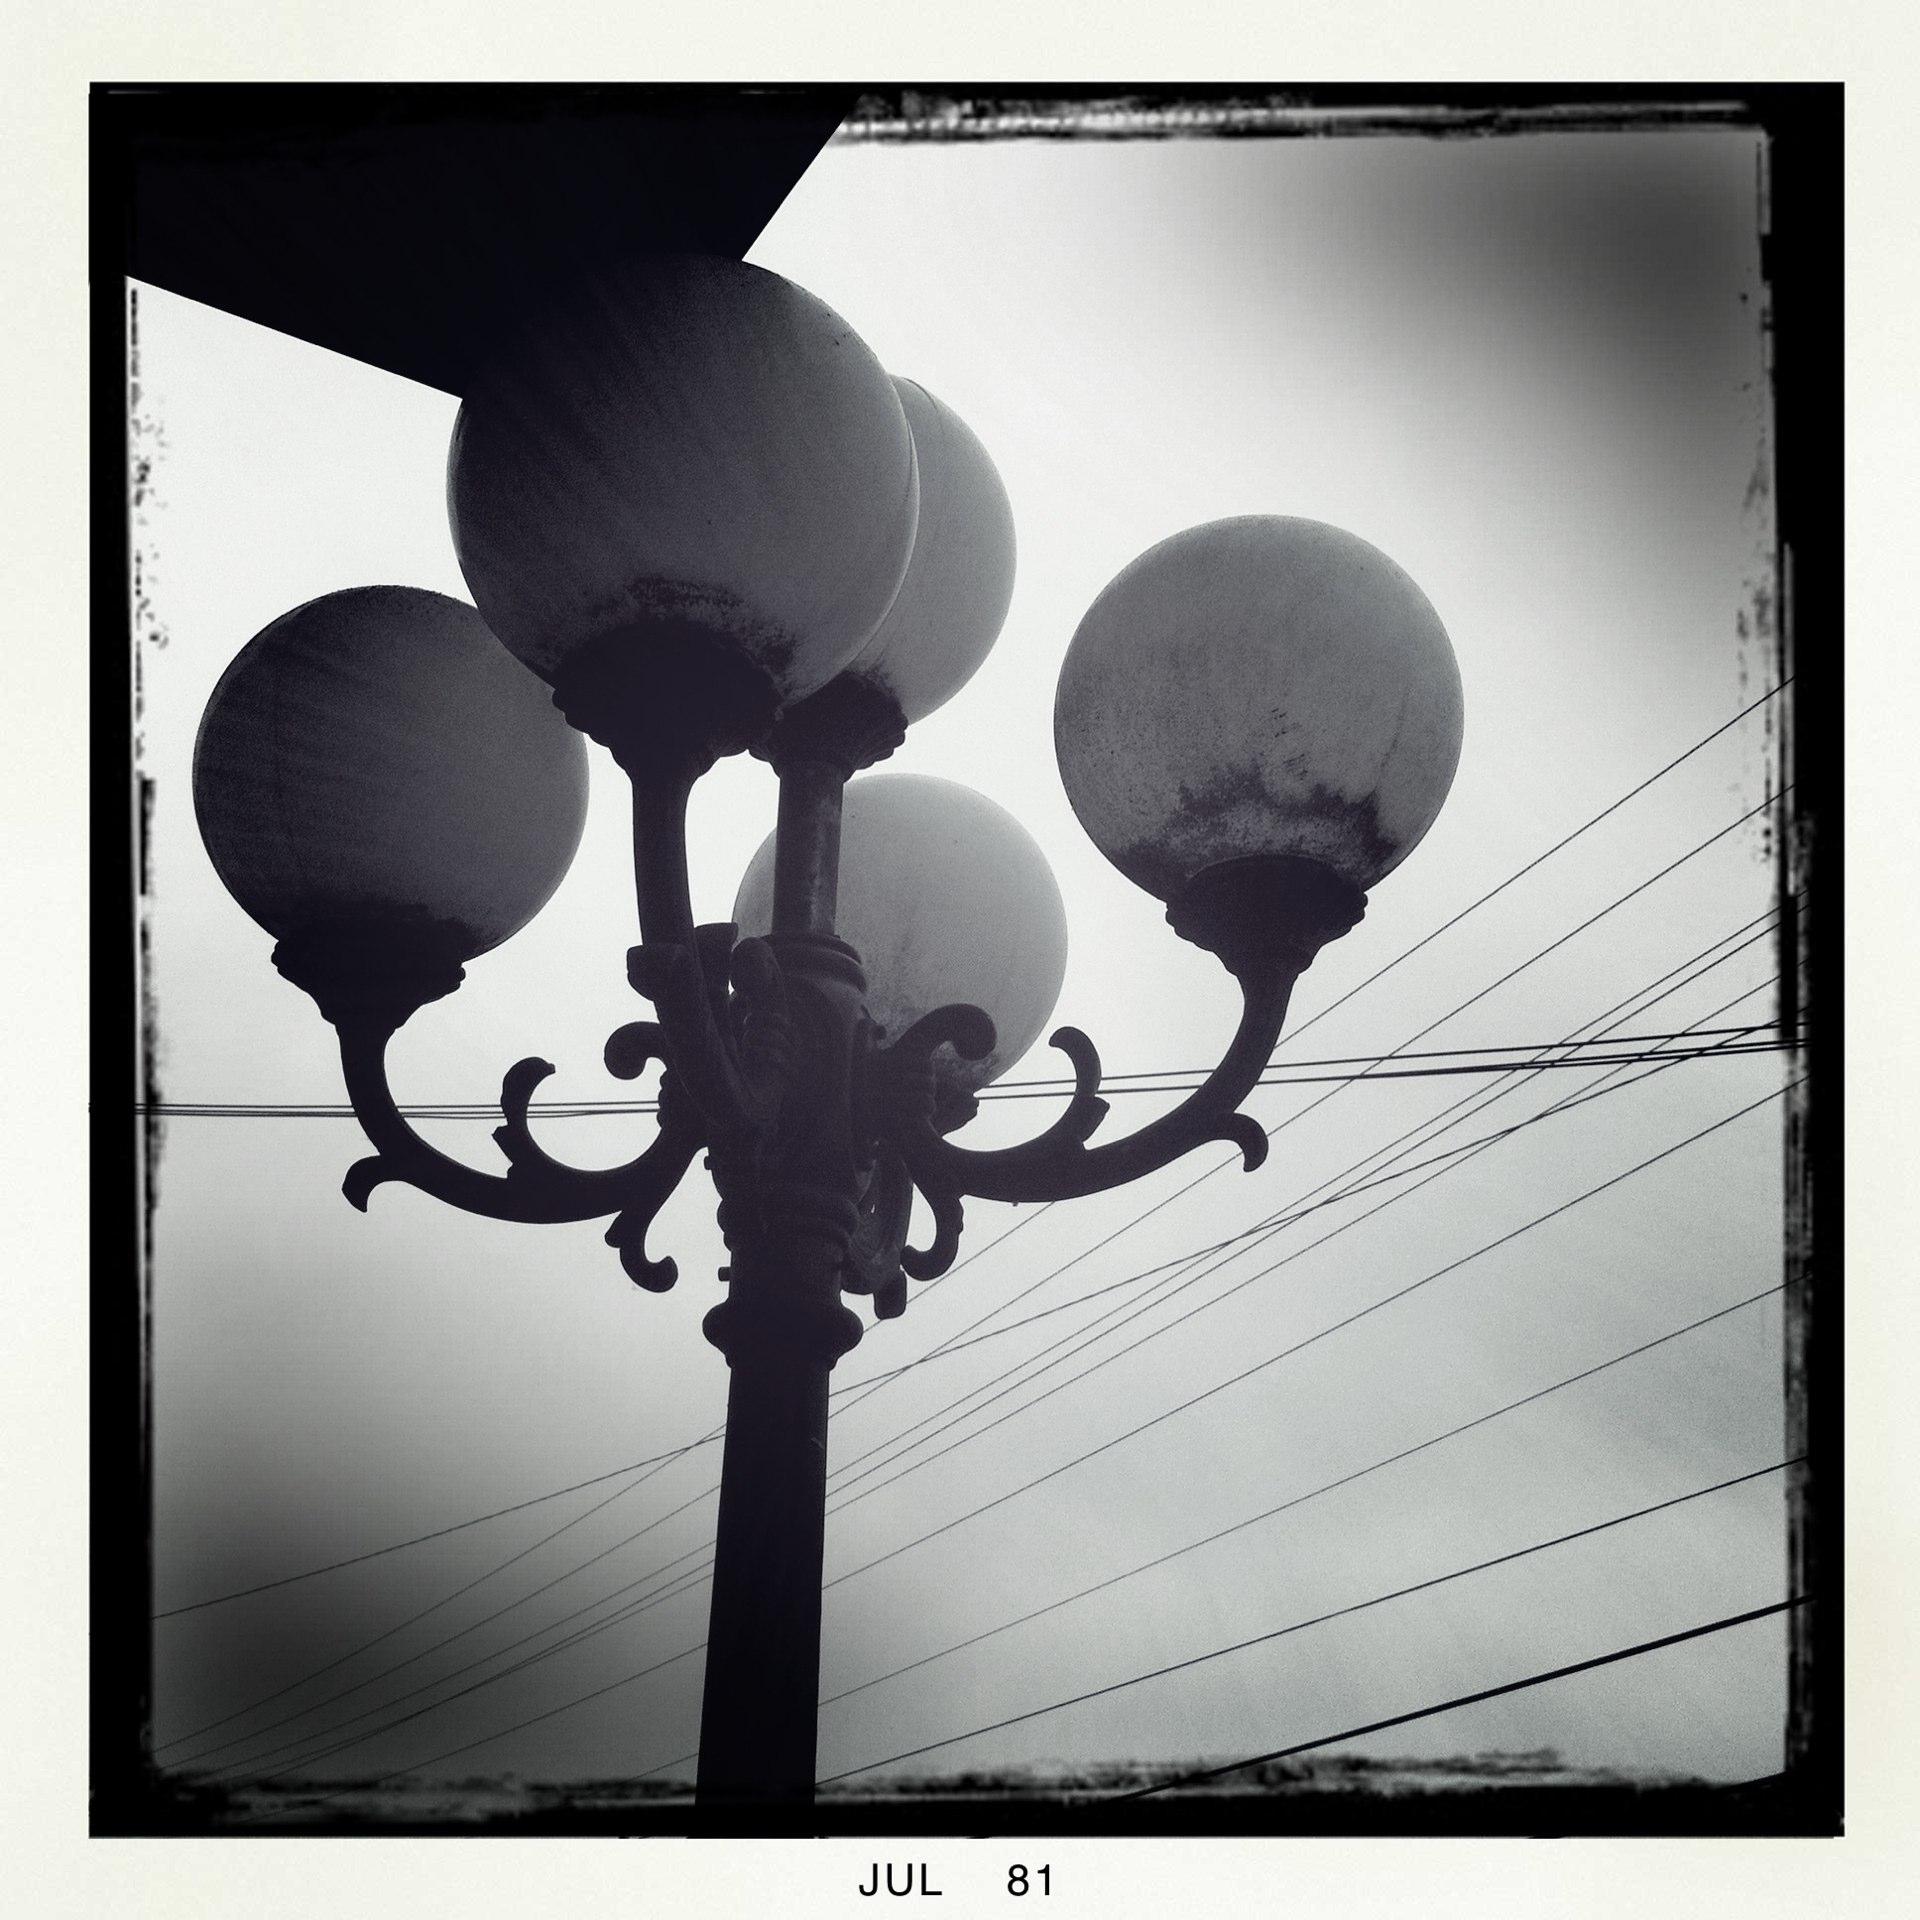 IMG_2515-1.jpg